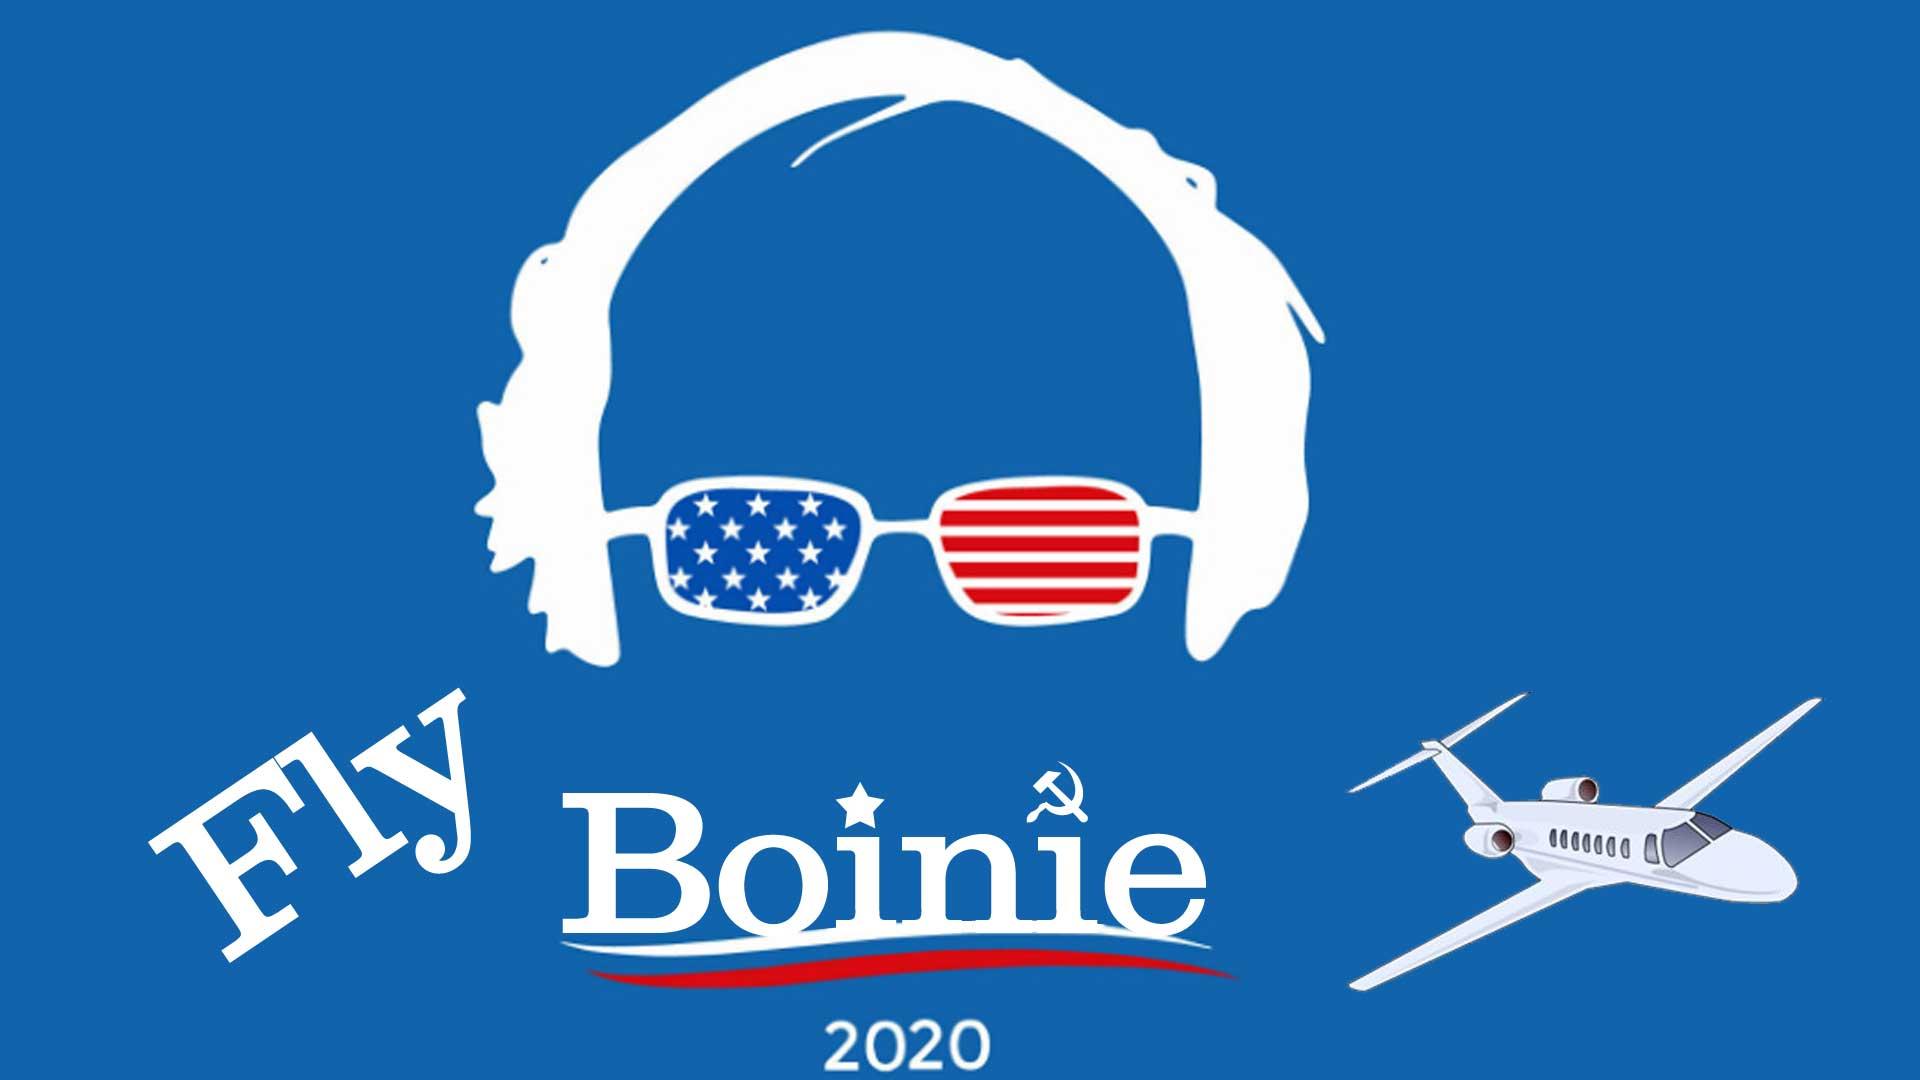 Fly Boinie